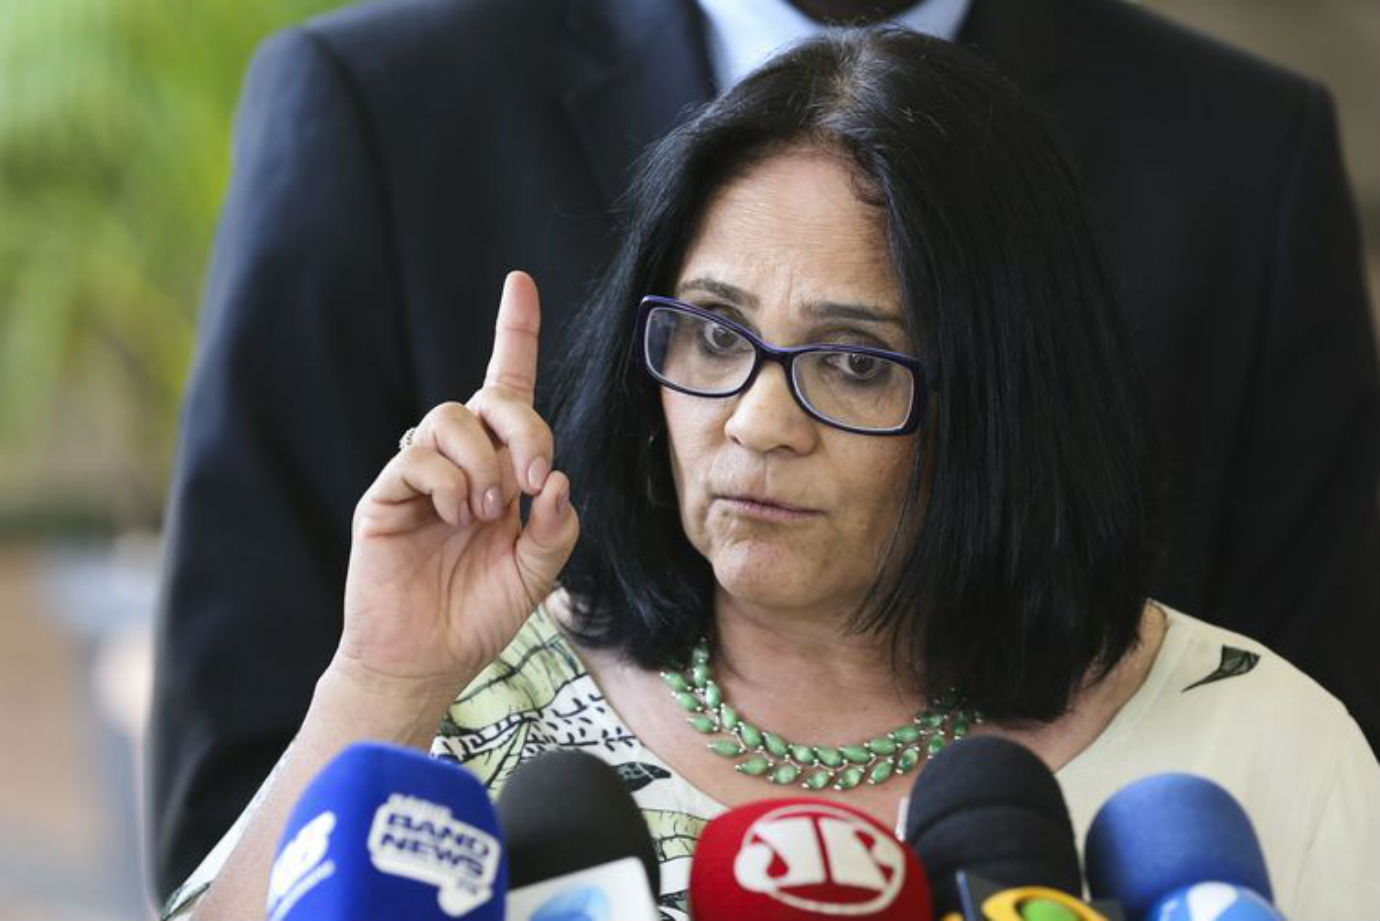 damares alves criptomoeda bolsonaro radio corredor - Ministra desmente